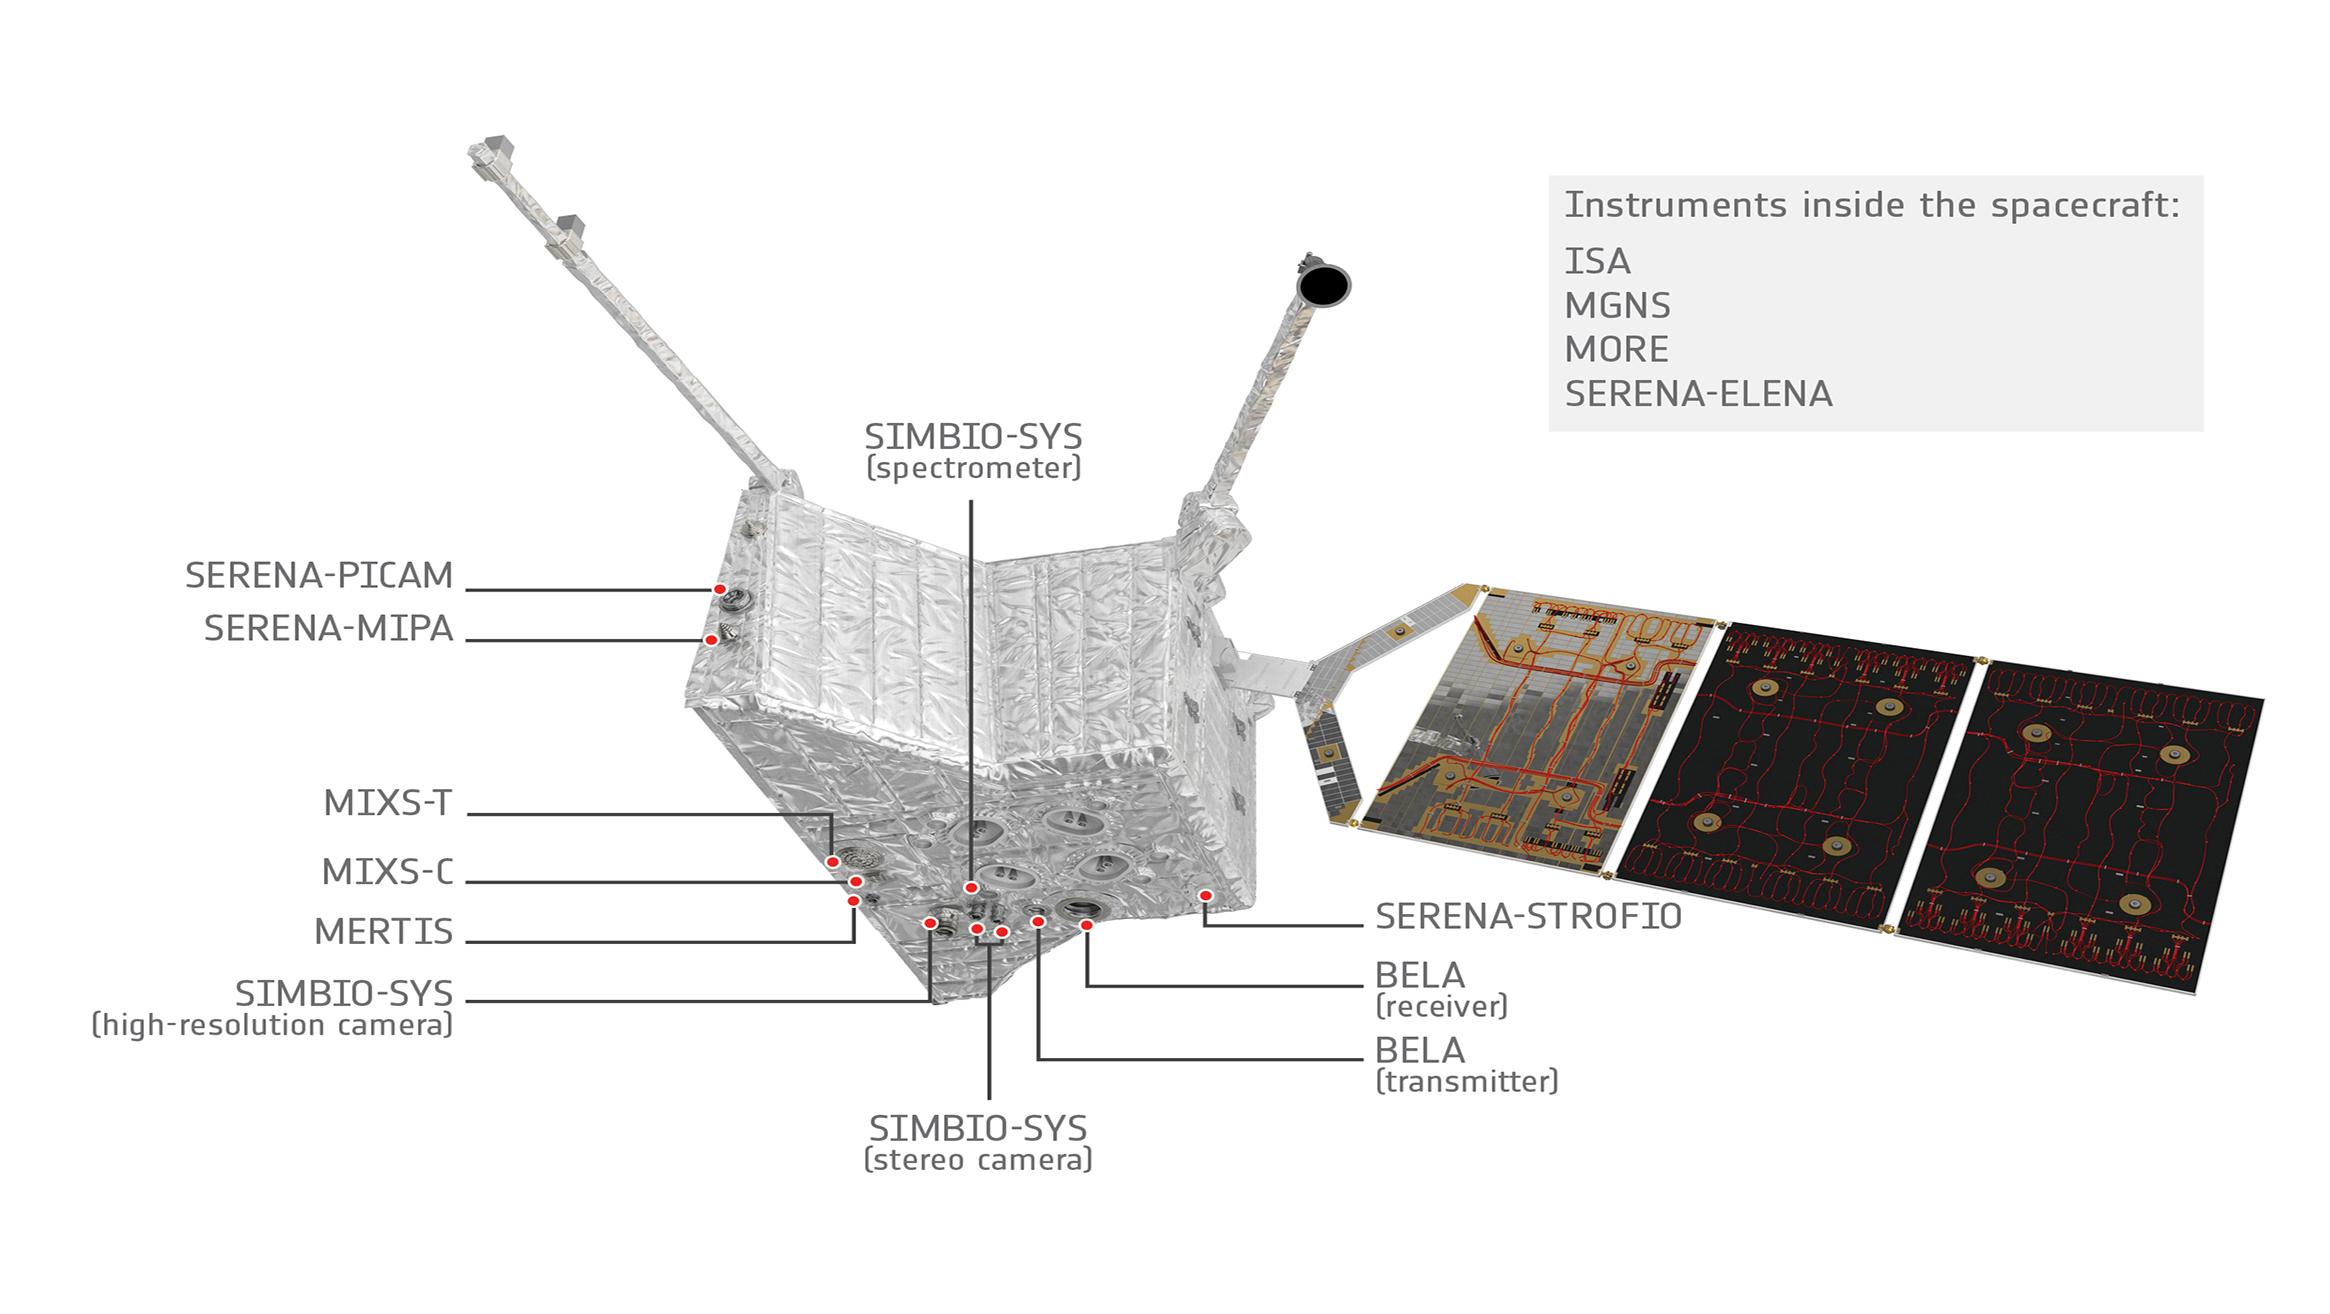 Die Instrumente an Bord des Mercury Planetary Orbiter (MPO) von BepiColombo. © ESA/ATG medialab